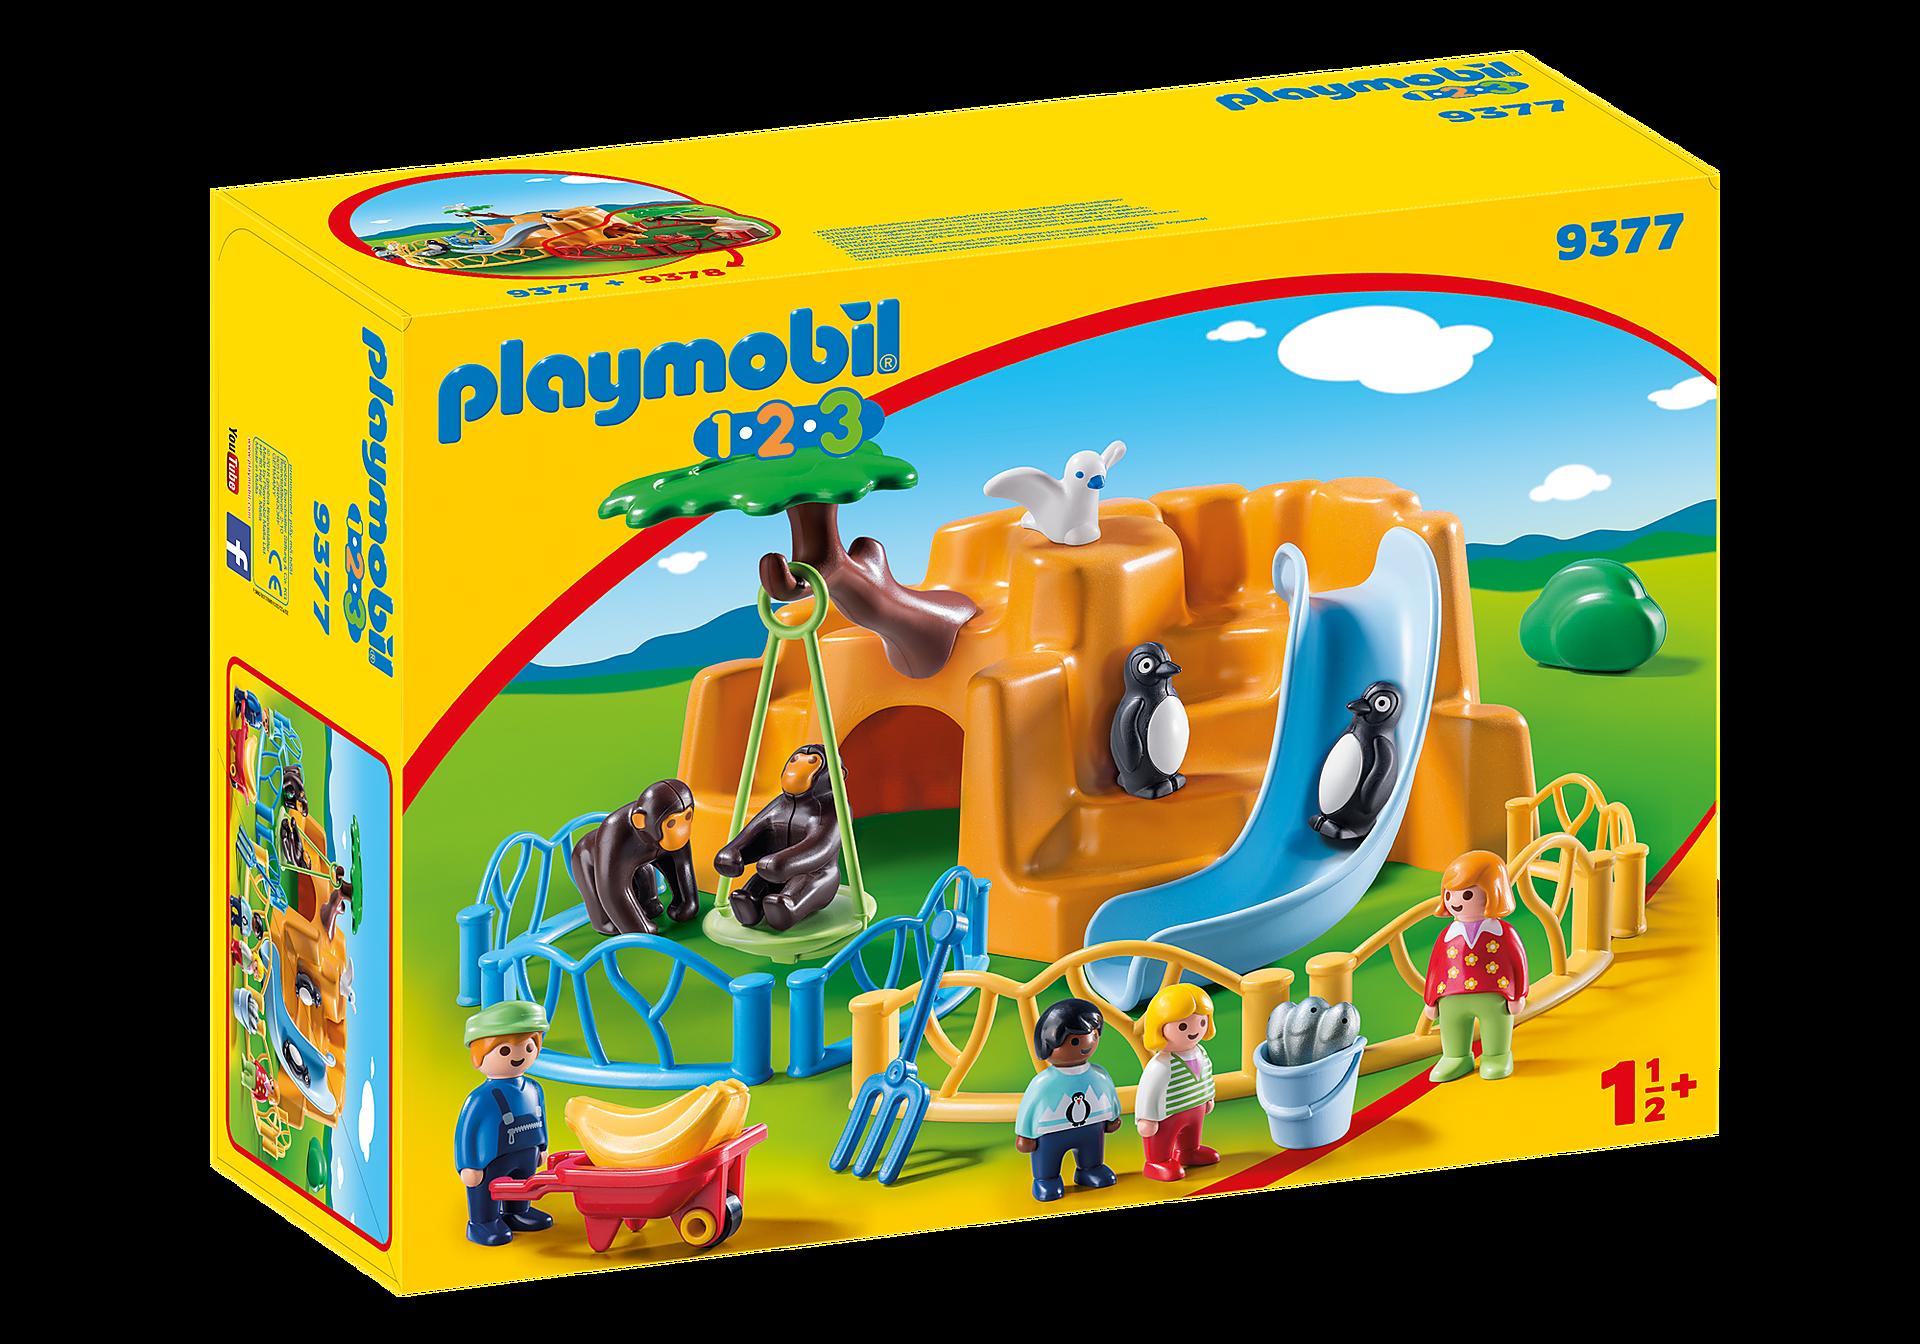 http://media.playmobil.com/i/playmobil/9377_product_box_front/1.2.3 Zoo